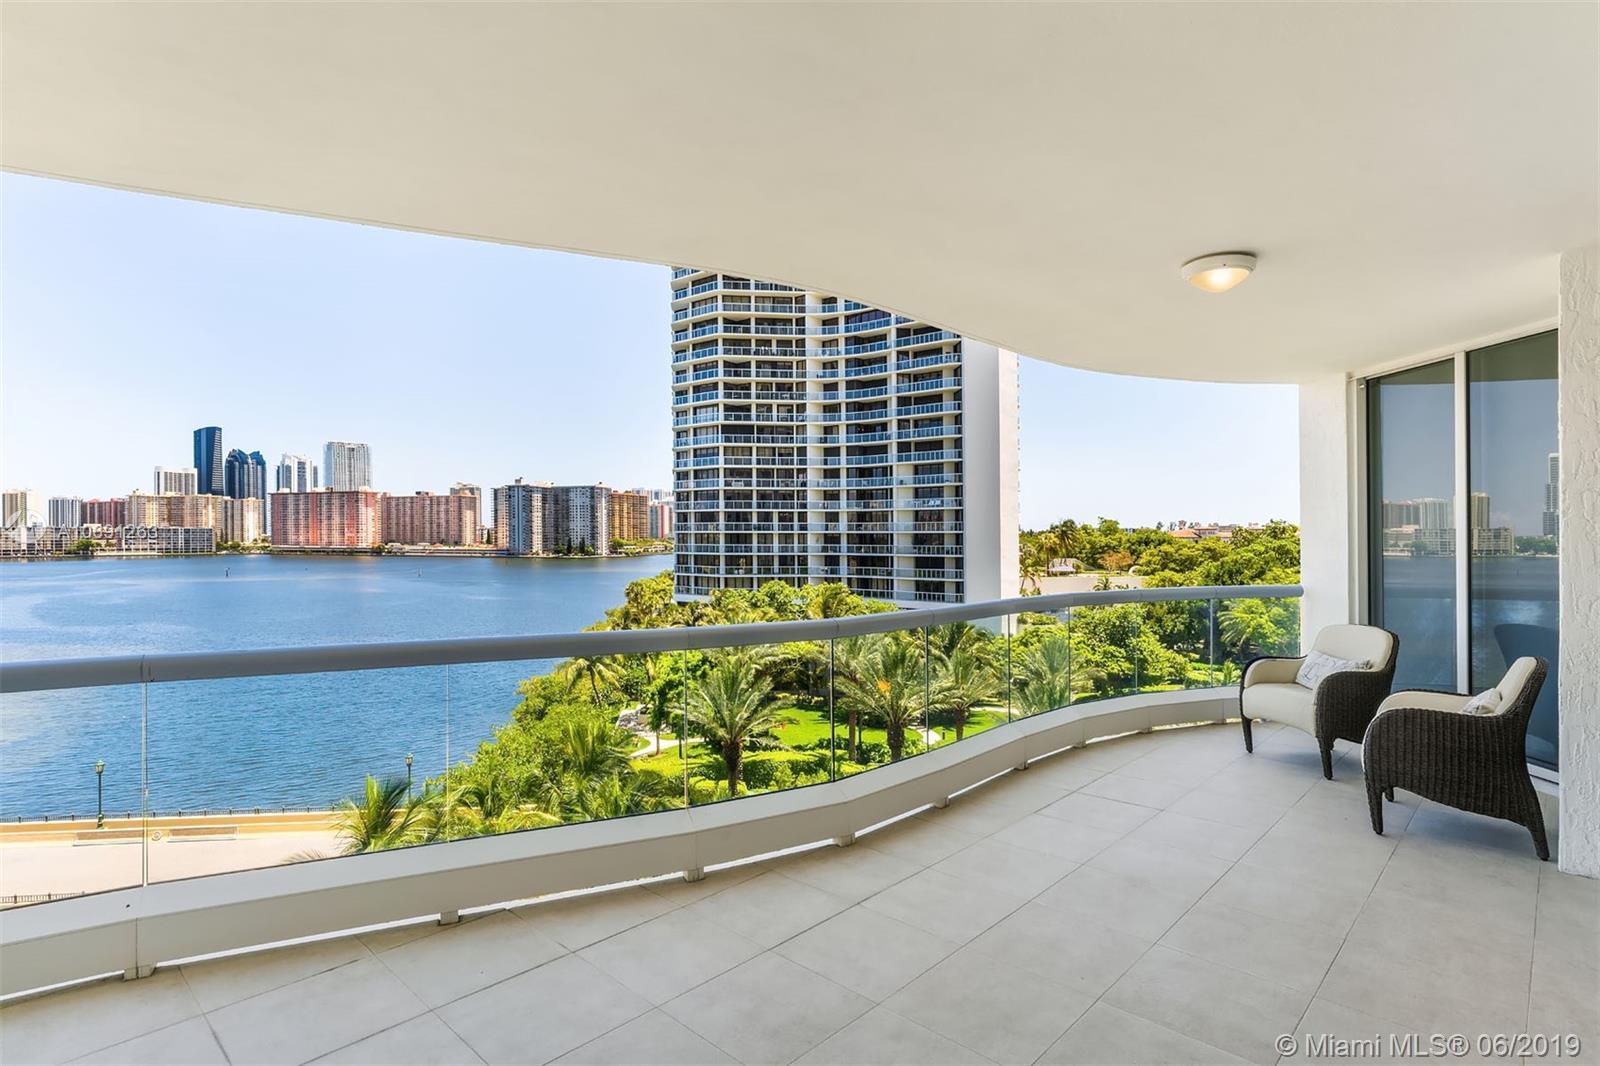 6000 Island Blvd, 606 - Aventura, Florida